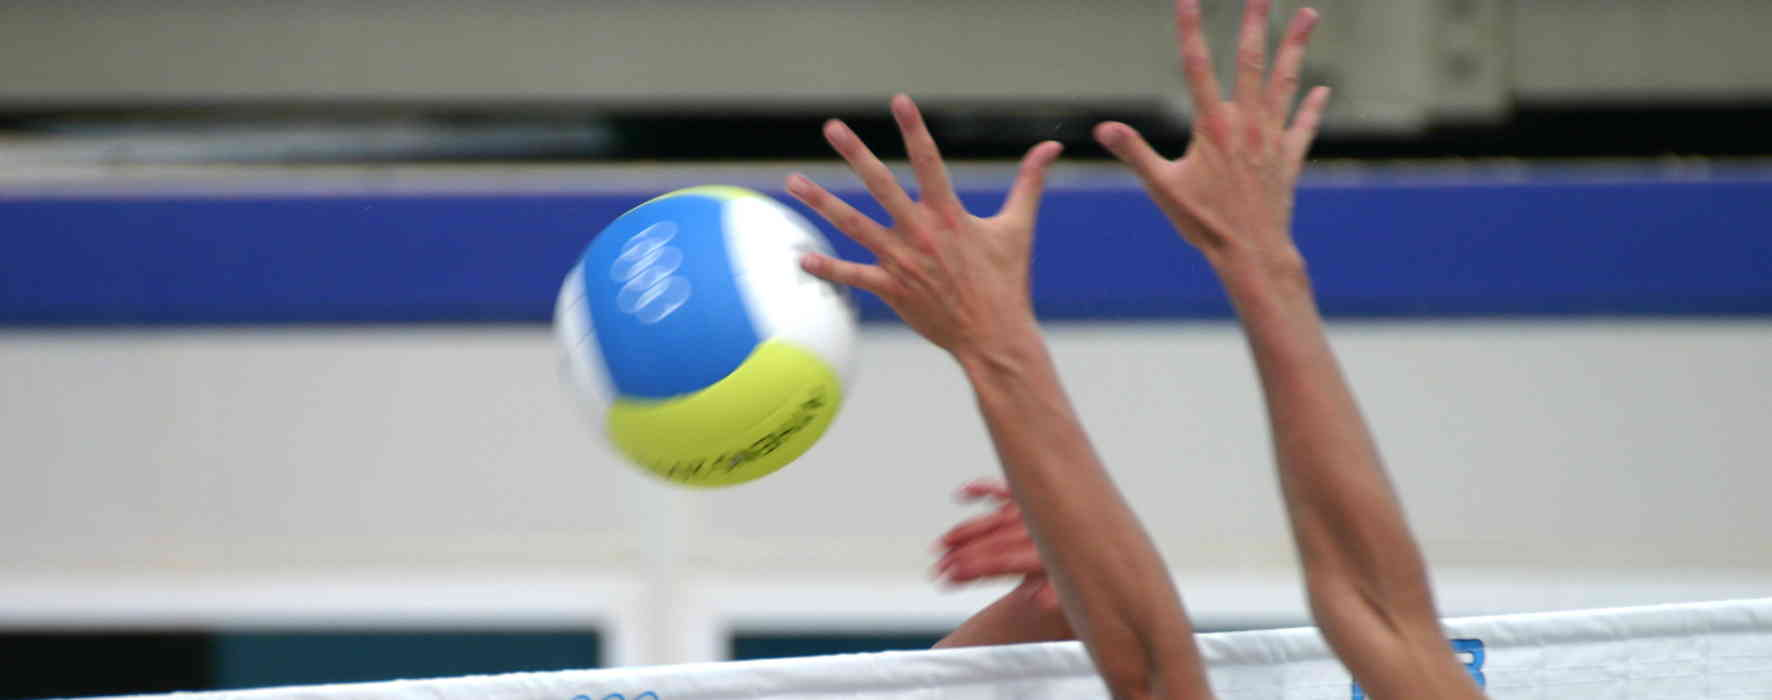 hands volleyball